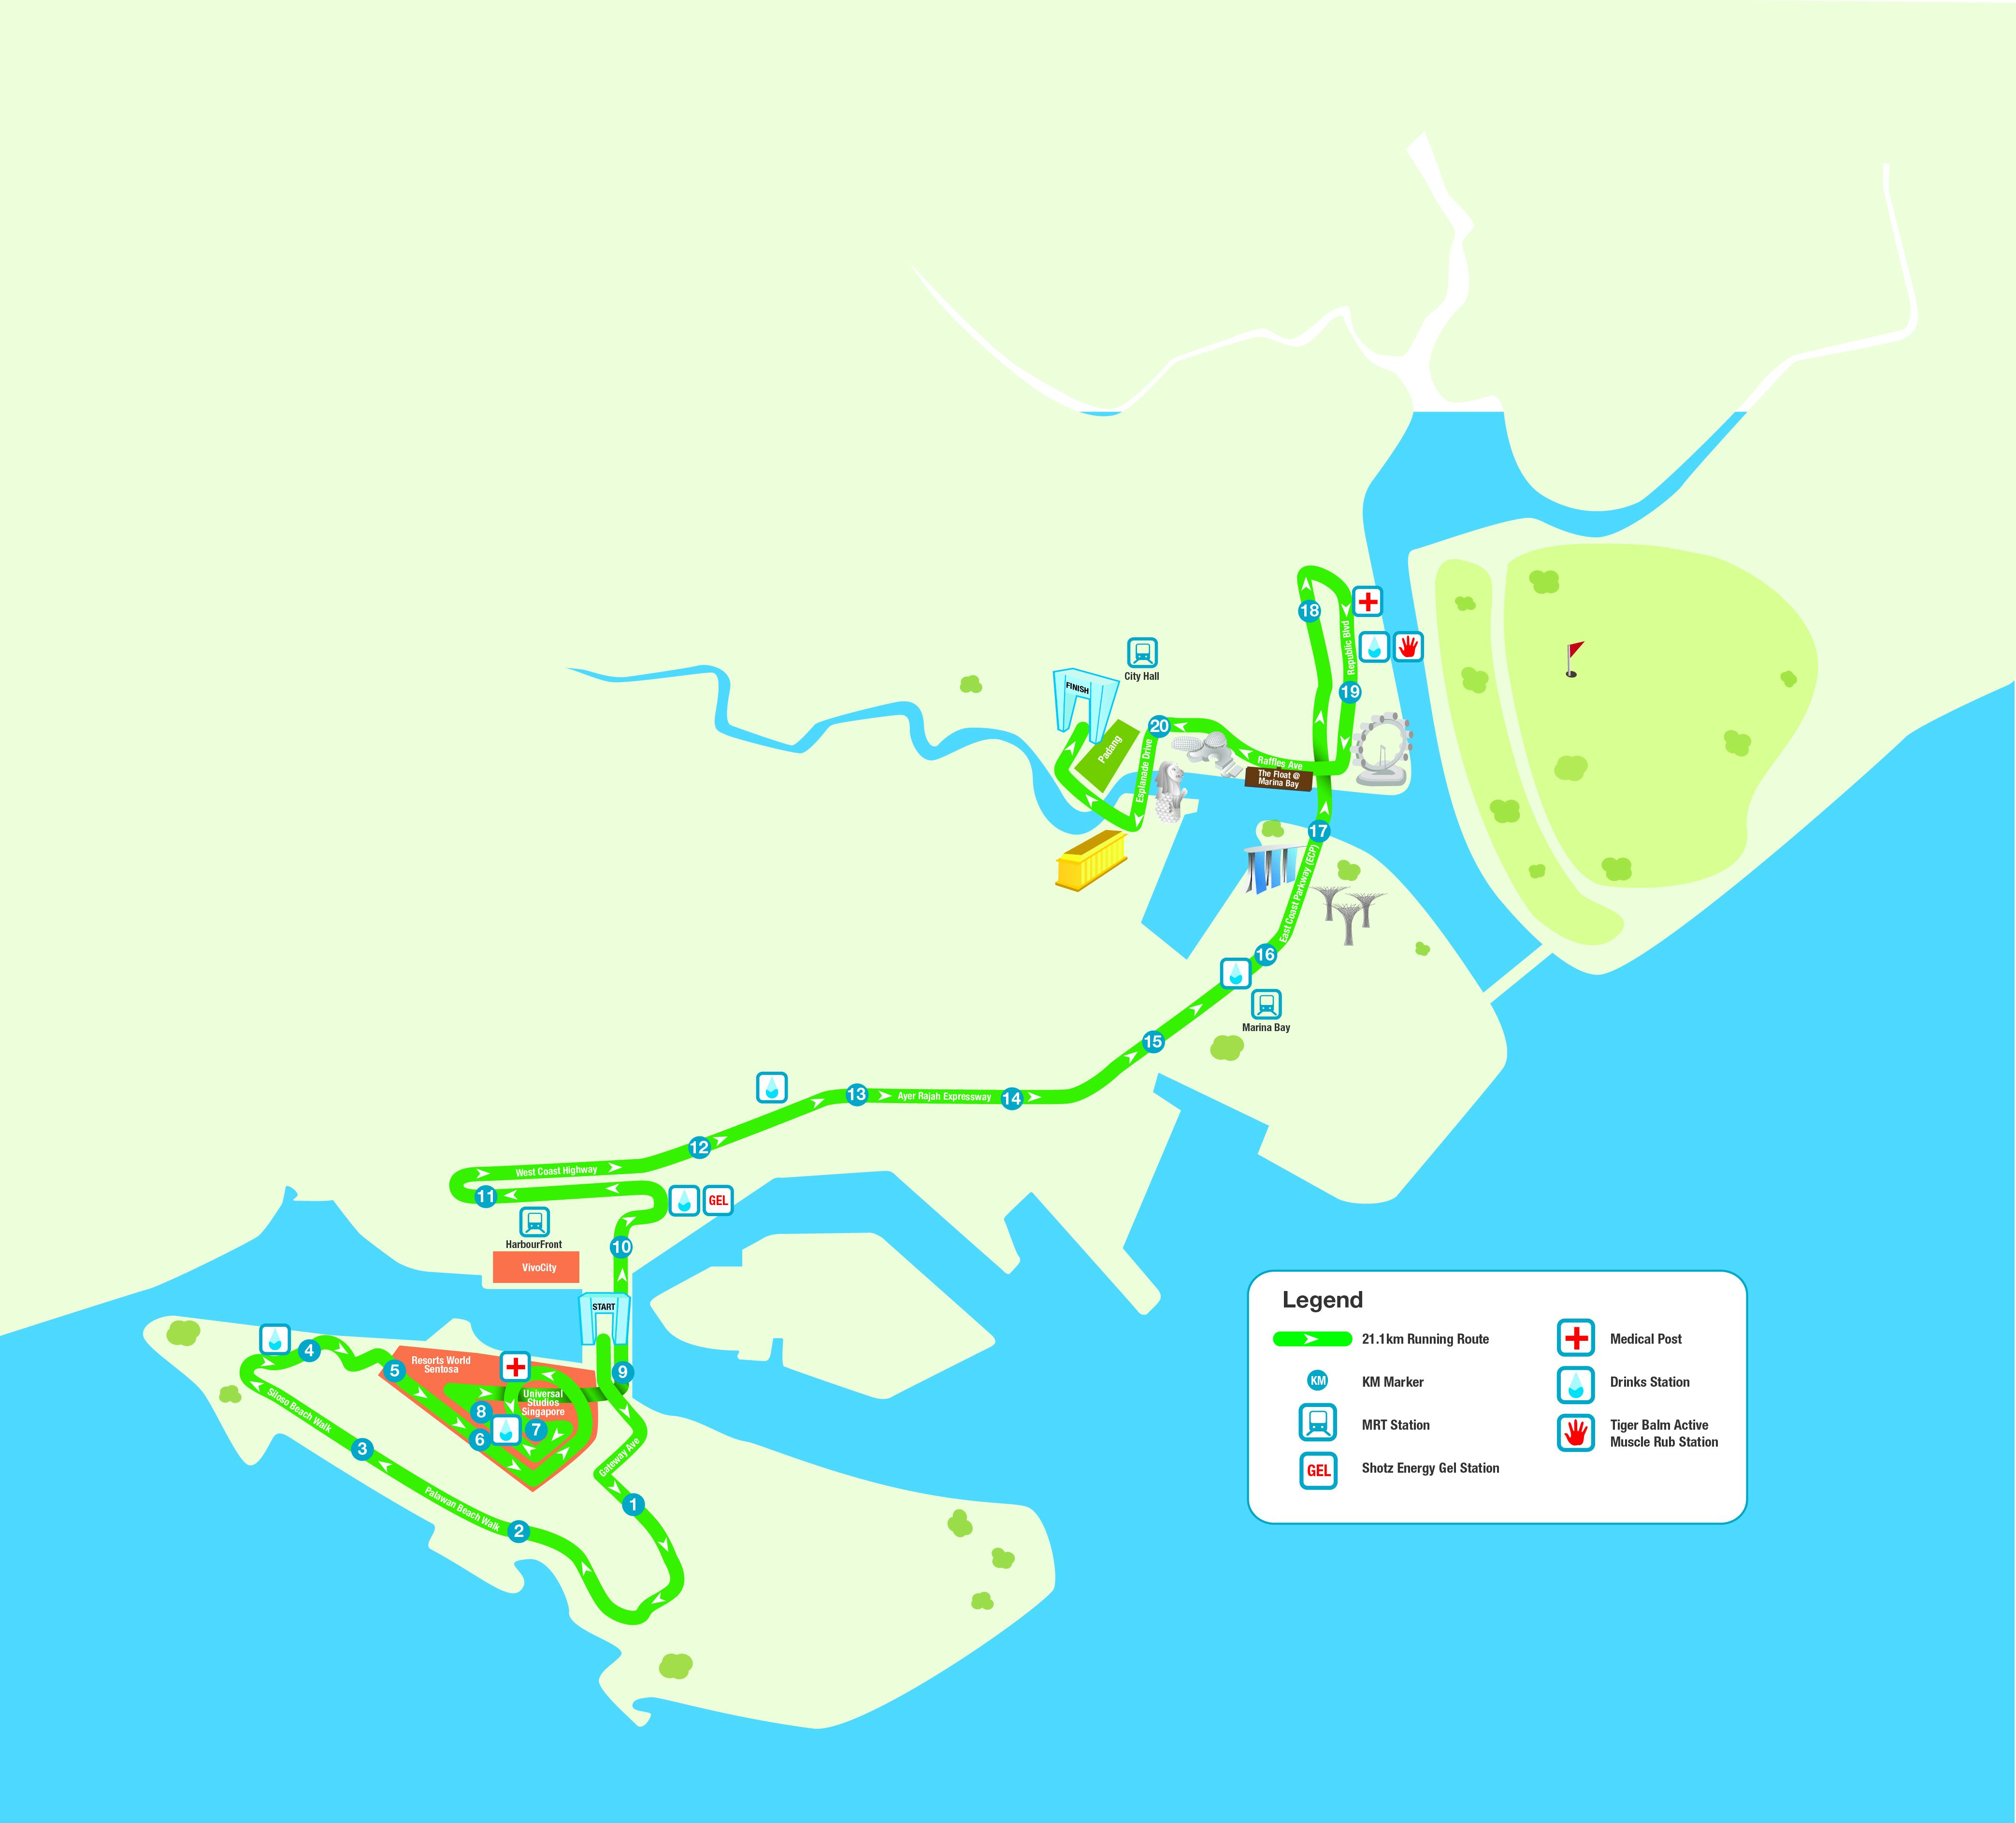 21km route map standard chartered marathon singapore